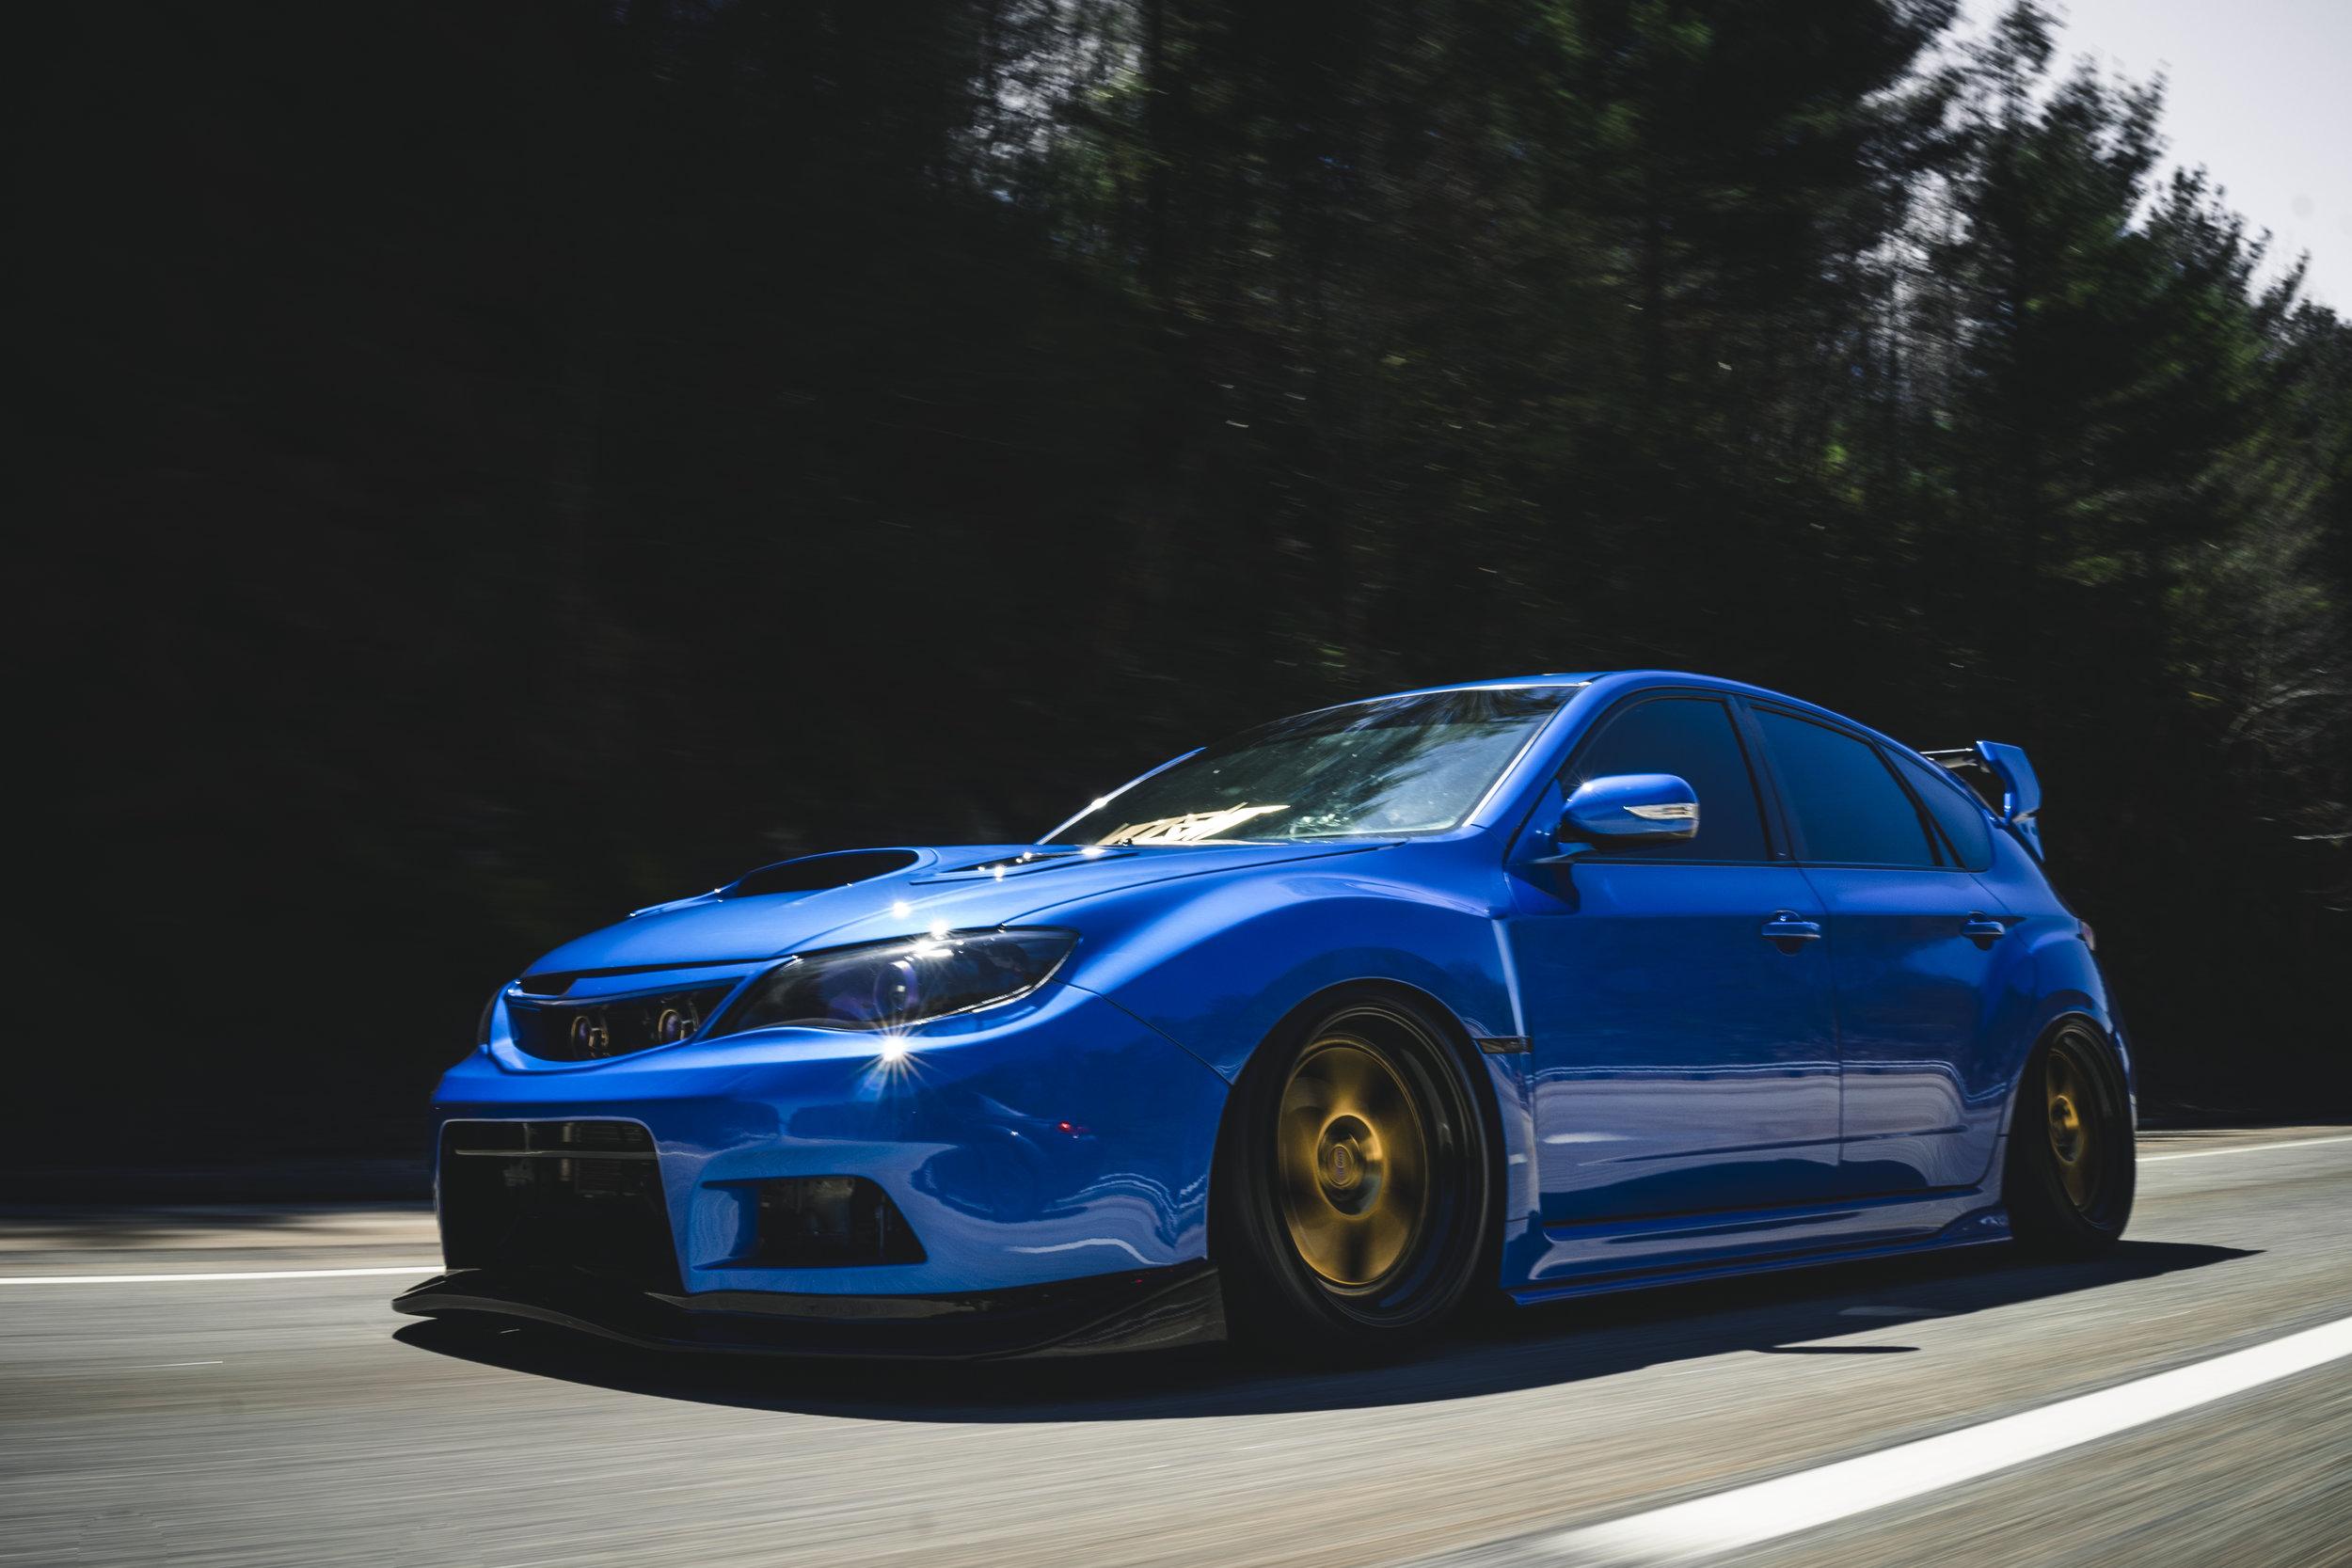 Nate Maloney's 2014 Subaru WRX